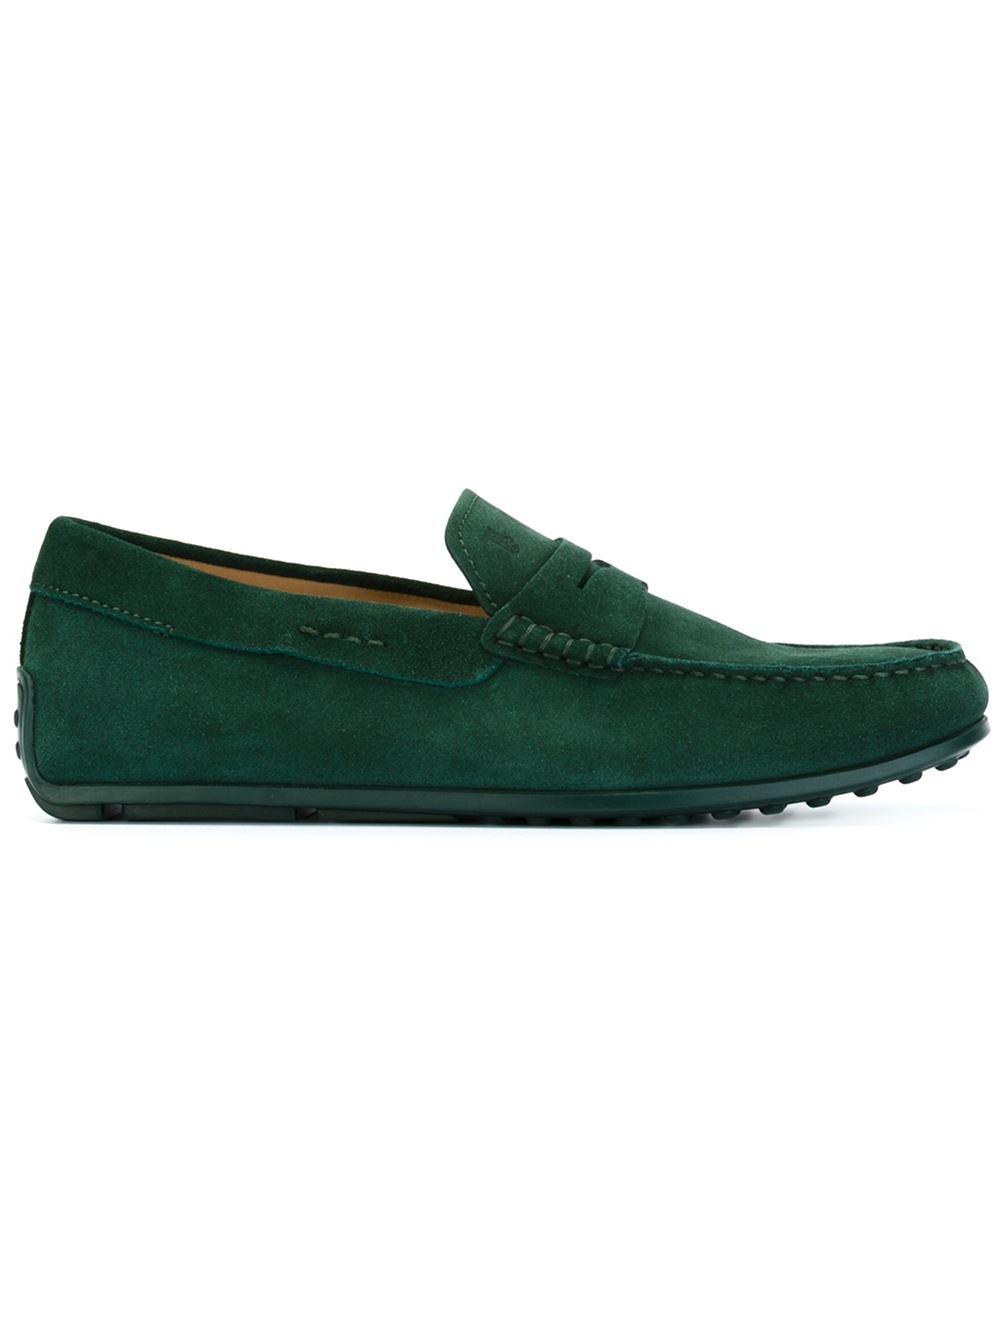 Calibrate Shoes Men